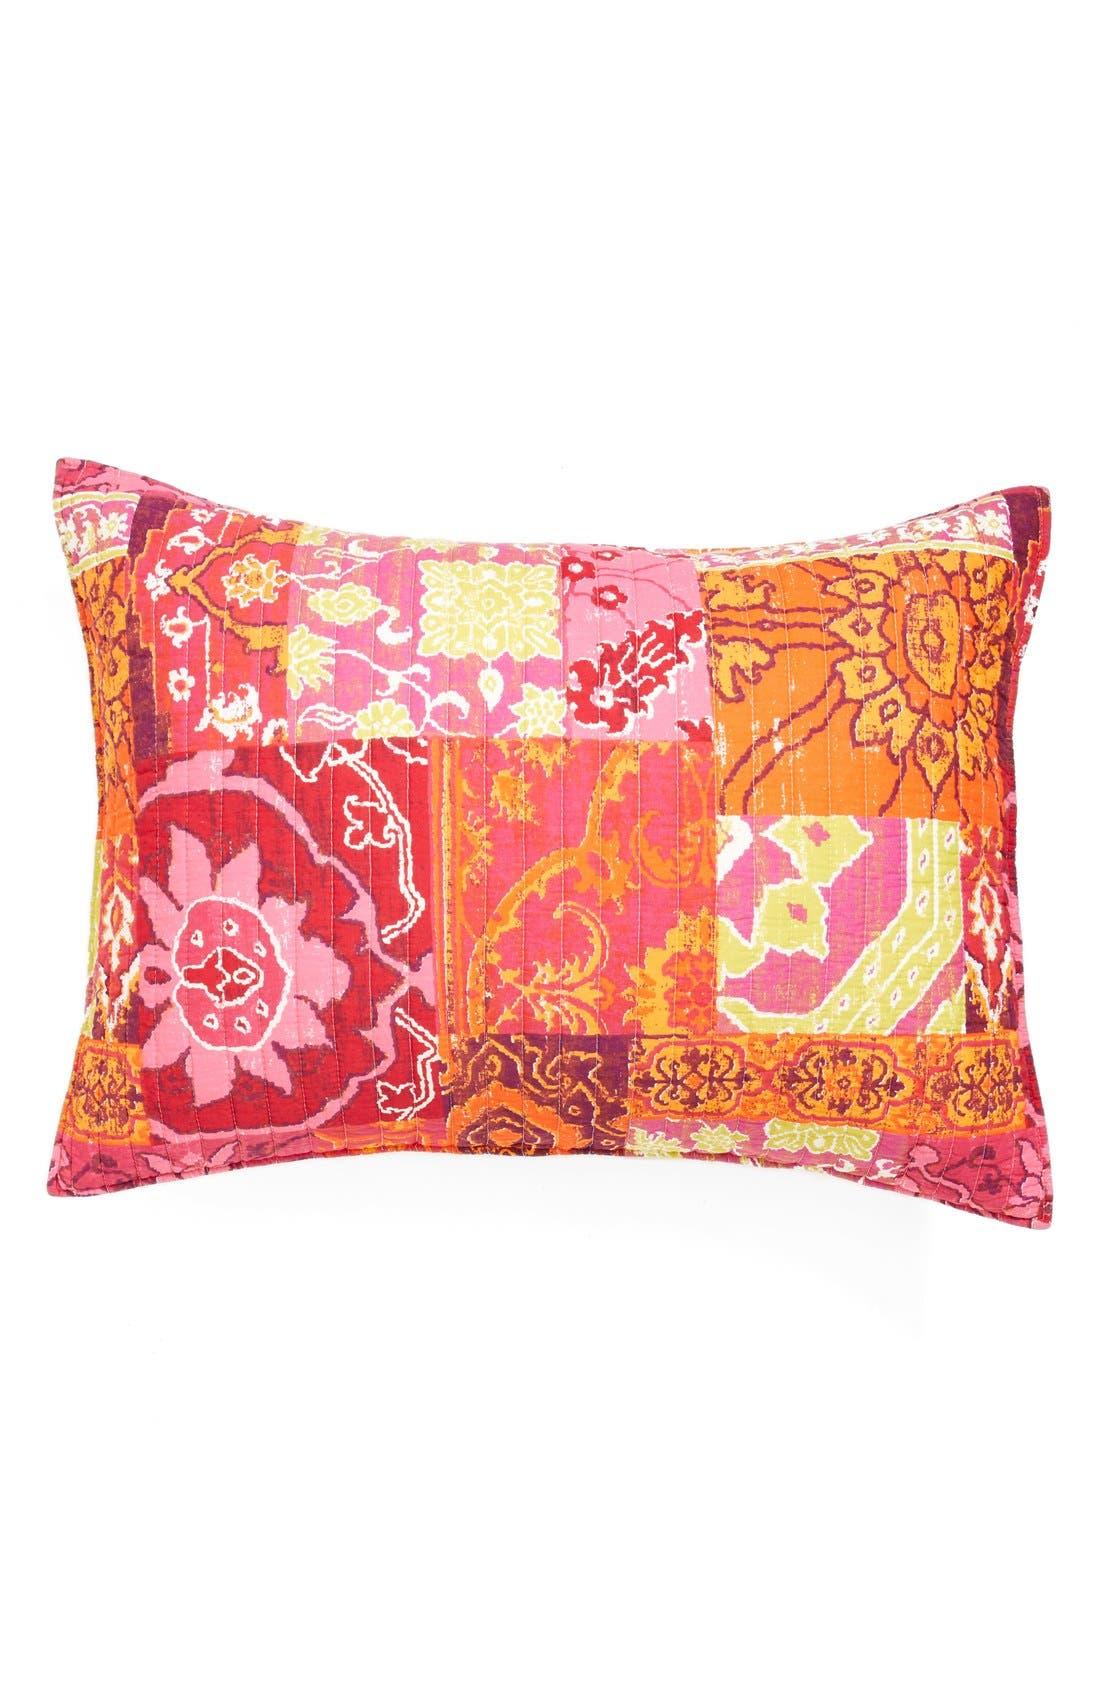 Main Image - Levtex 'Aja Bright' Pillow Sham